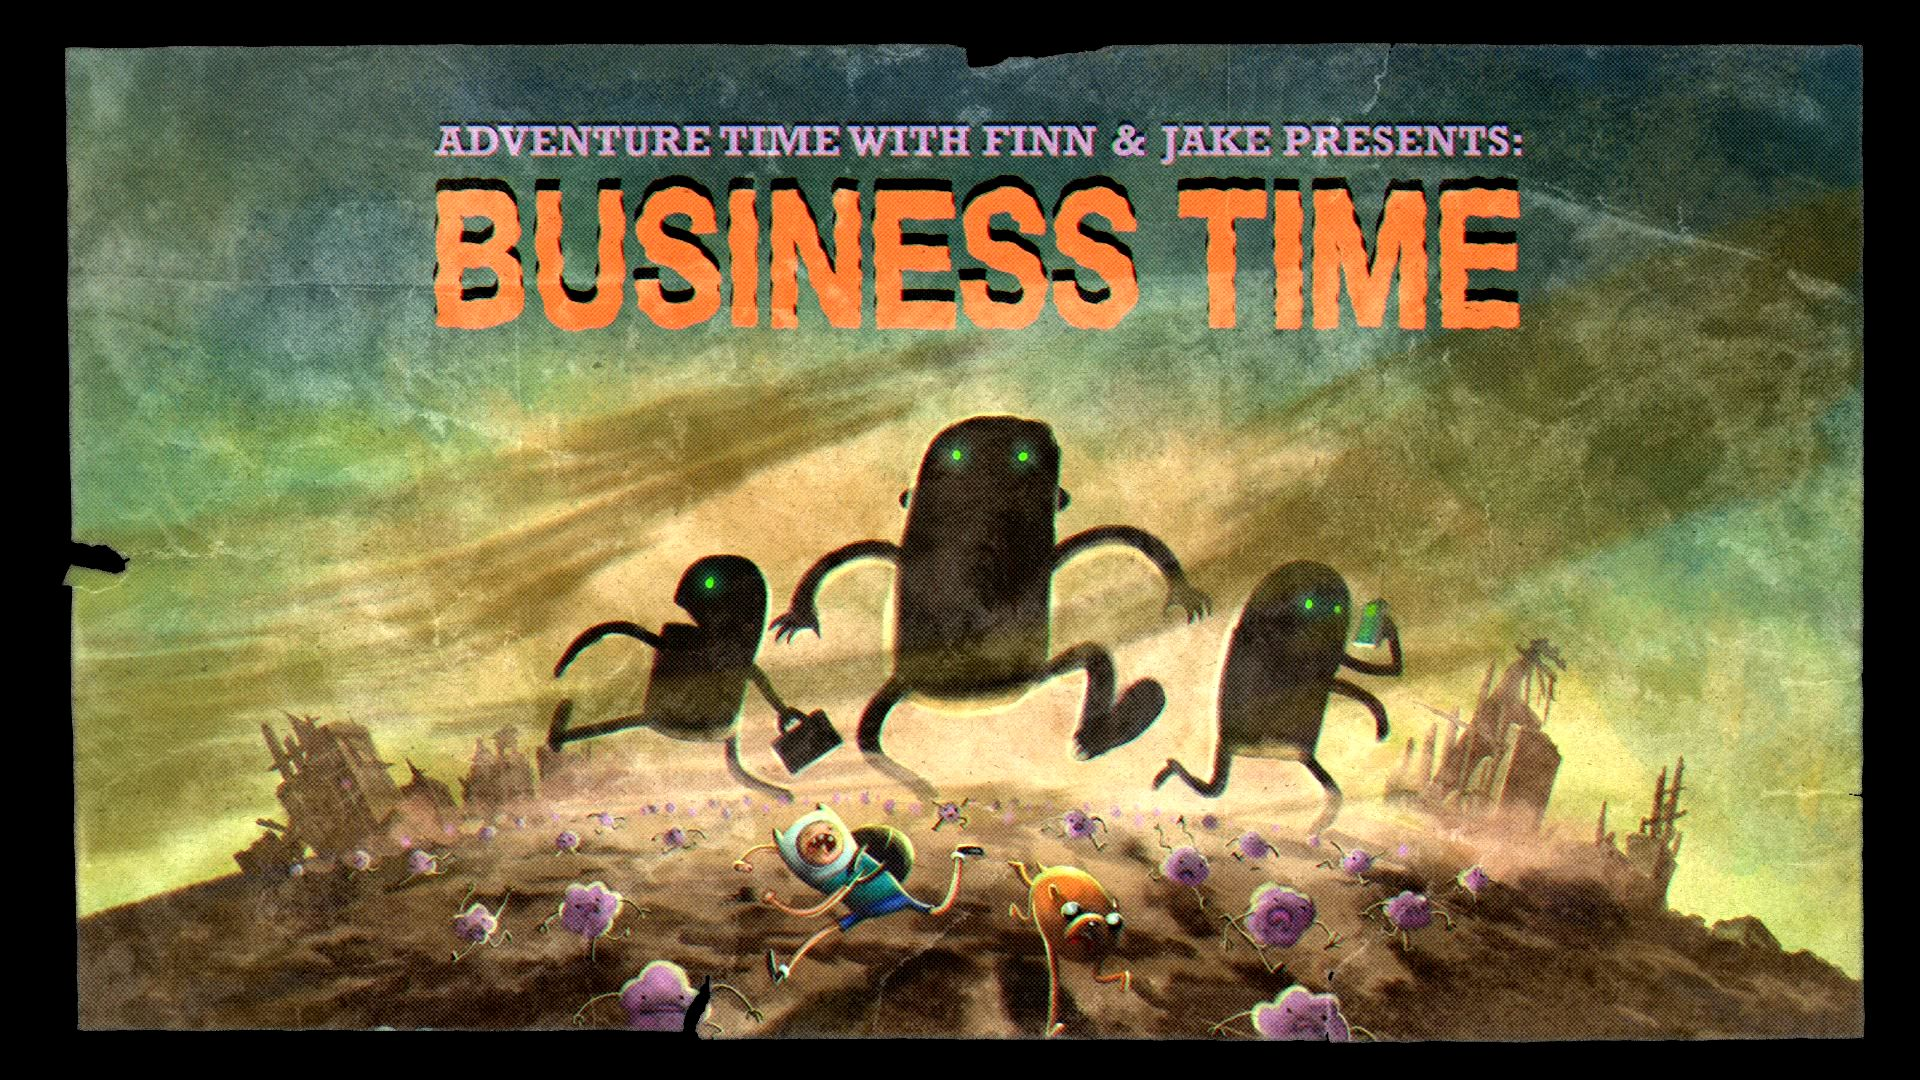 File:Titlecard S1E8 businesstime.jpg